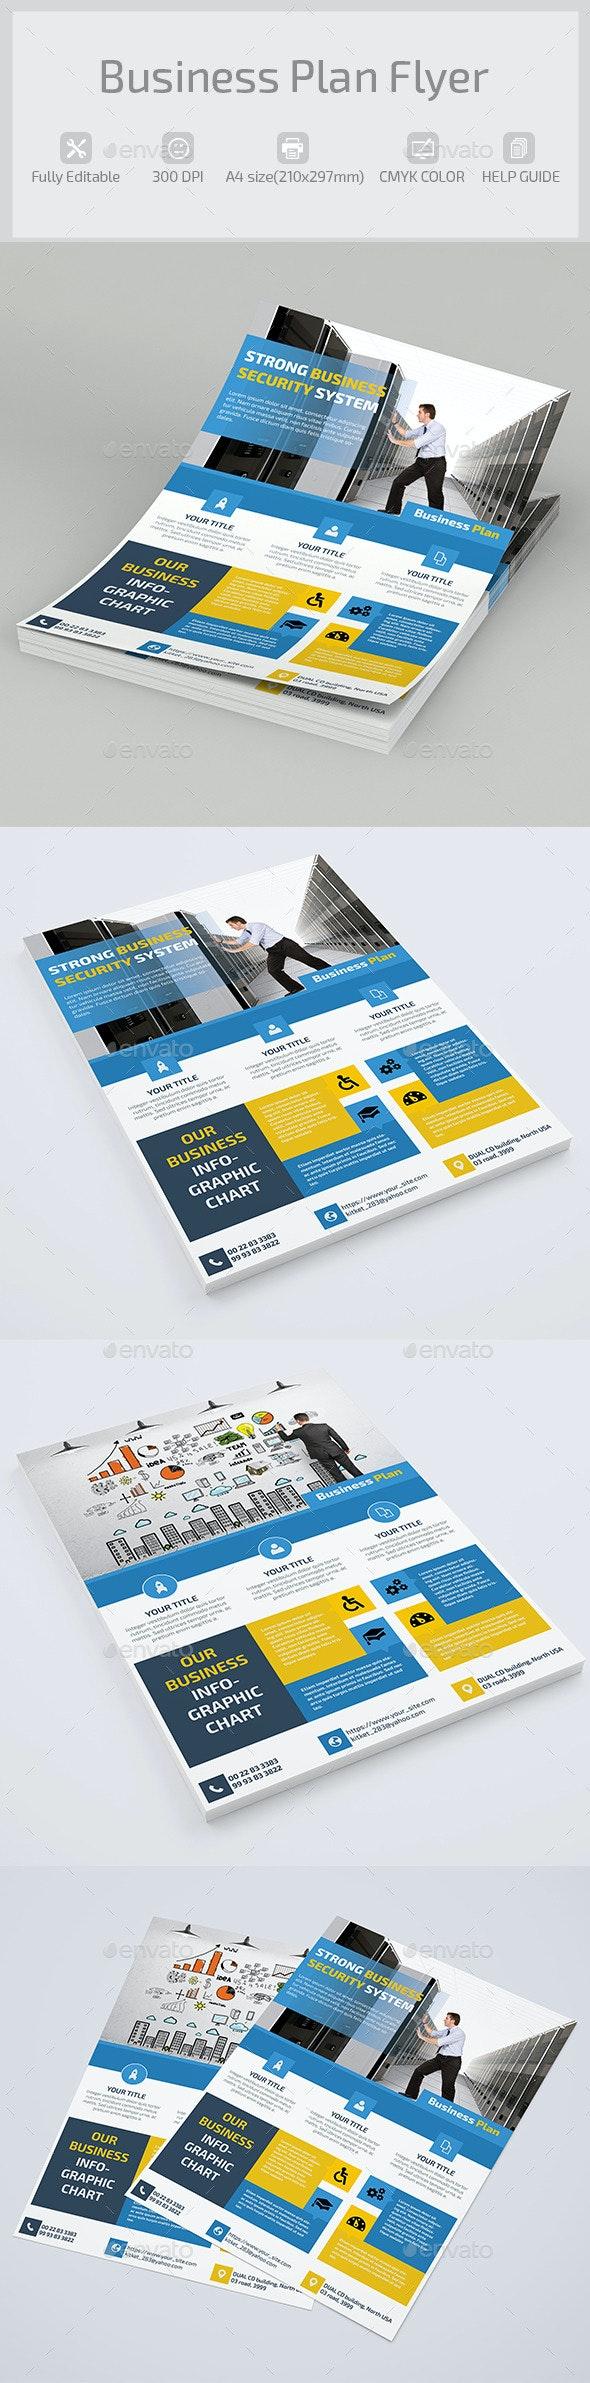 Business Plan Flyer - Corporate Flyers